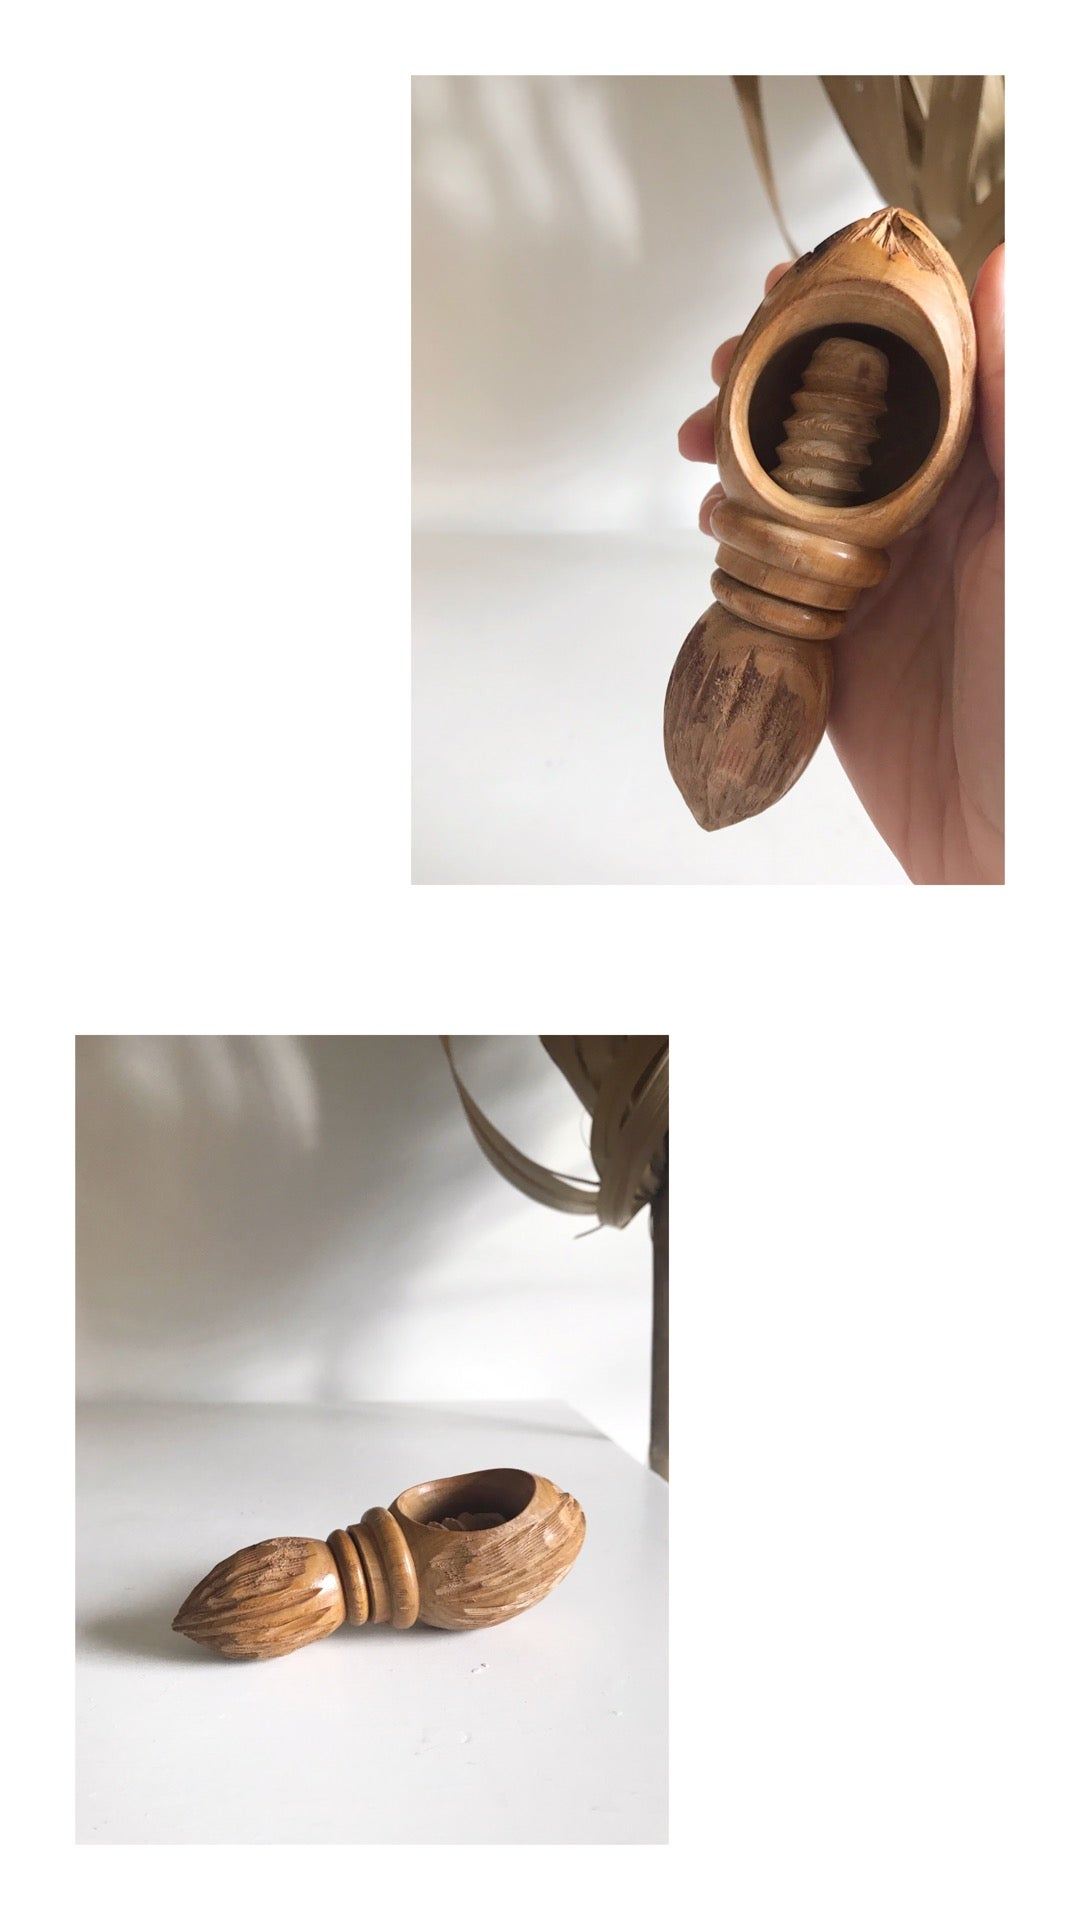 Image of Hand Carved Wooden Nut Cracker